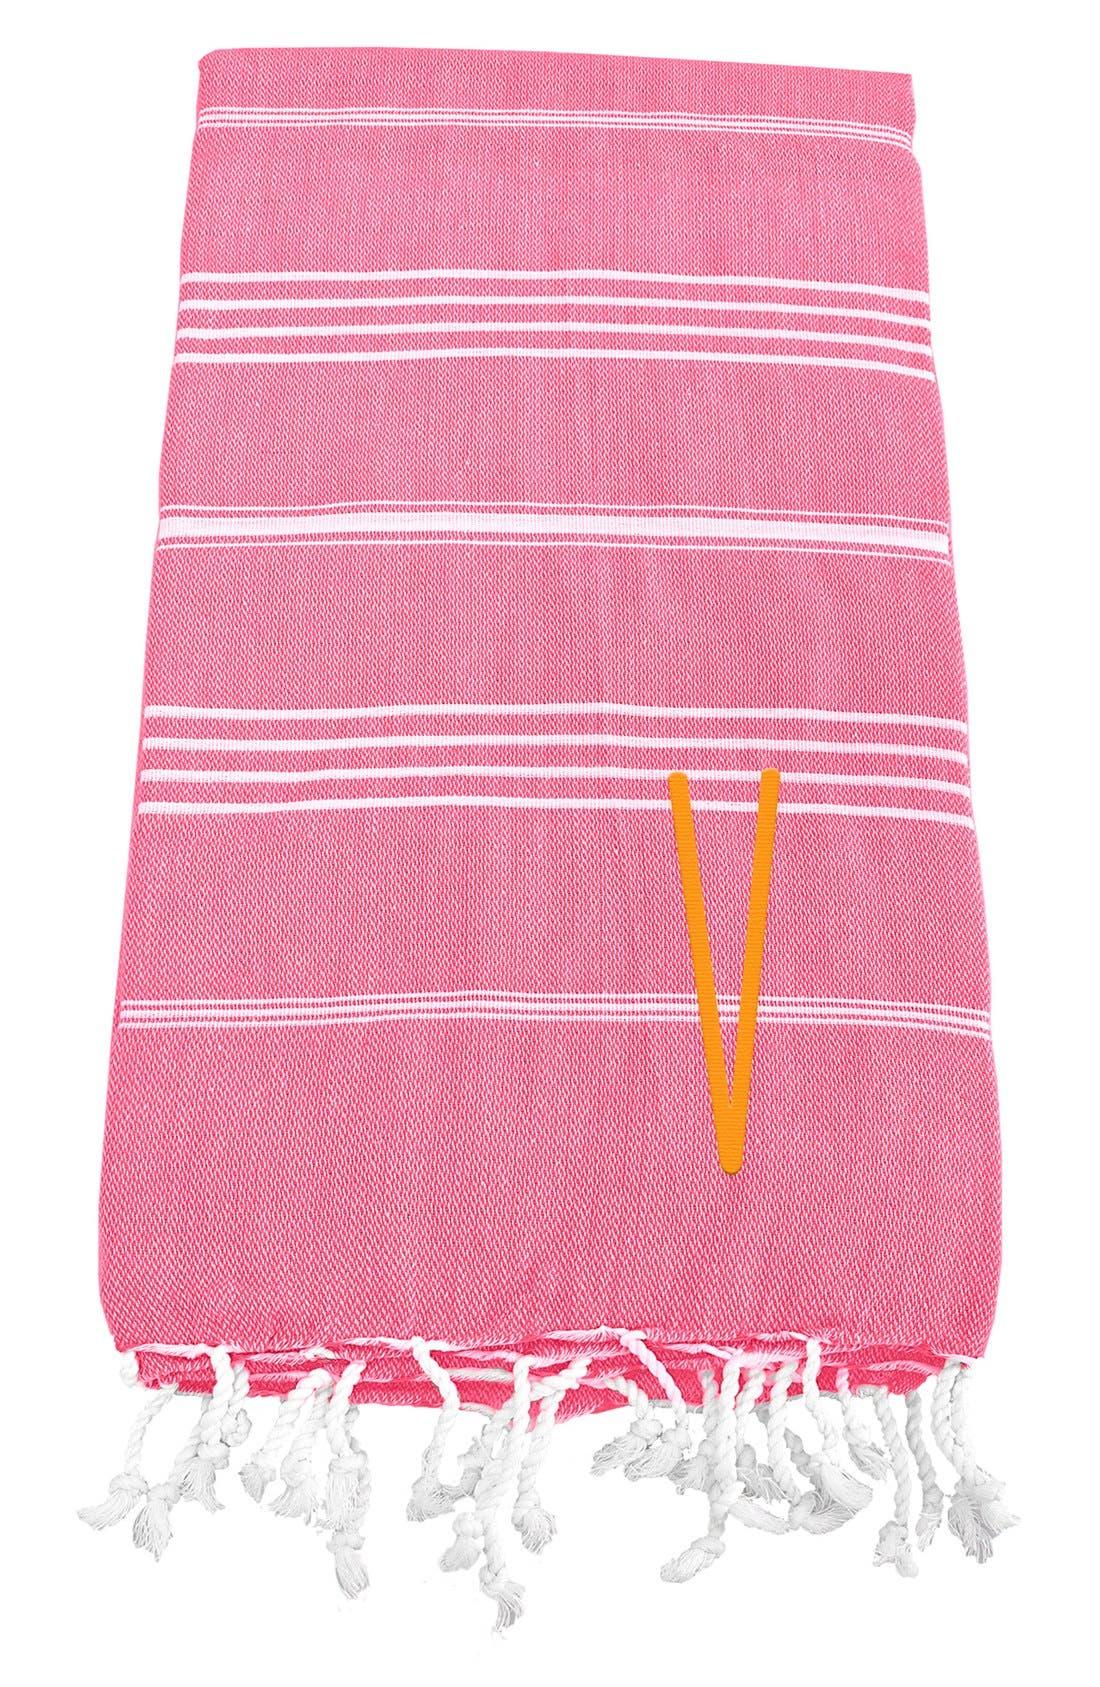 Monogram Turkish Cotton Towel,                             Main thumbnail 158, color,